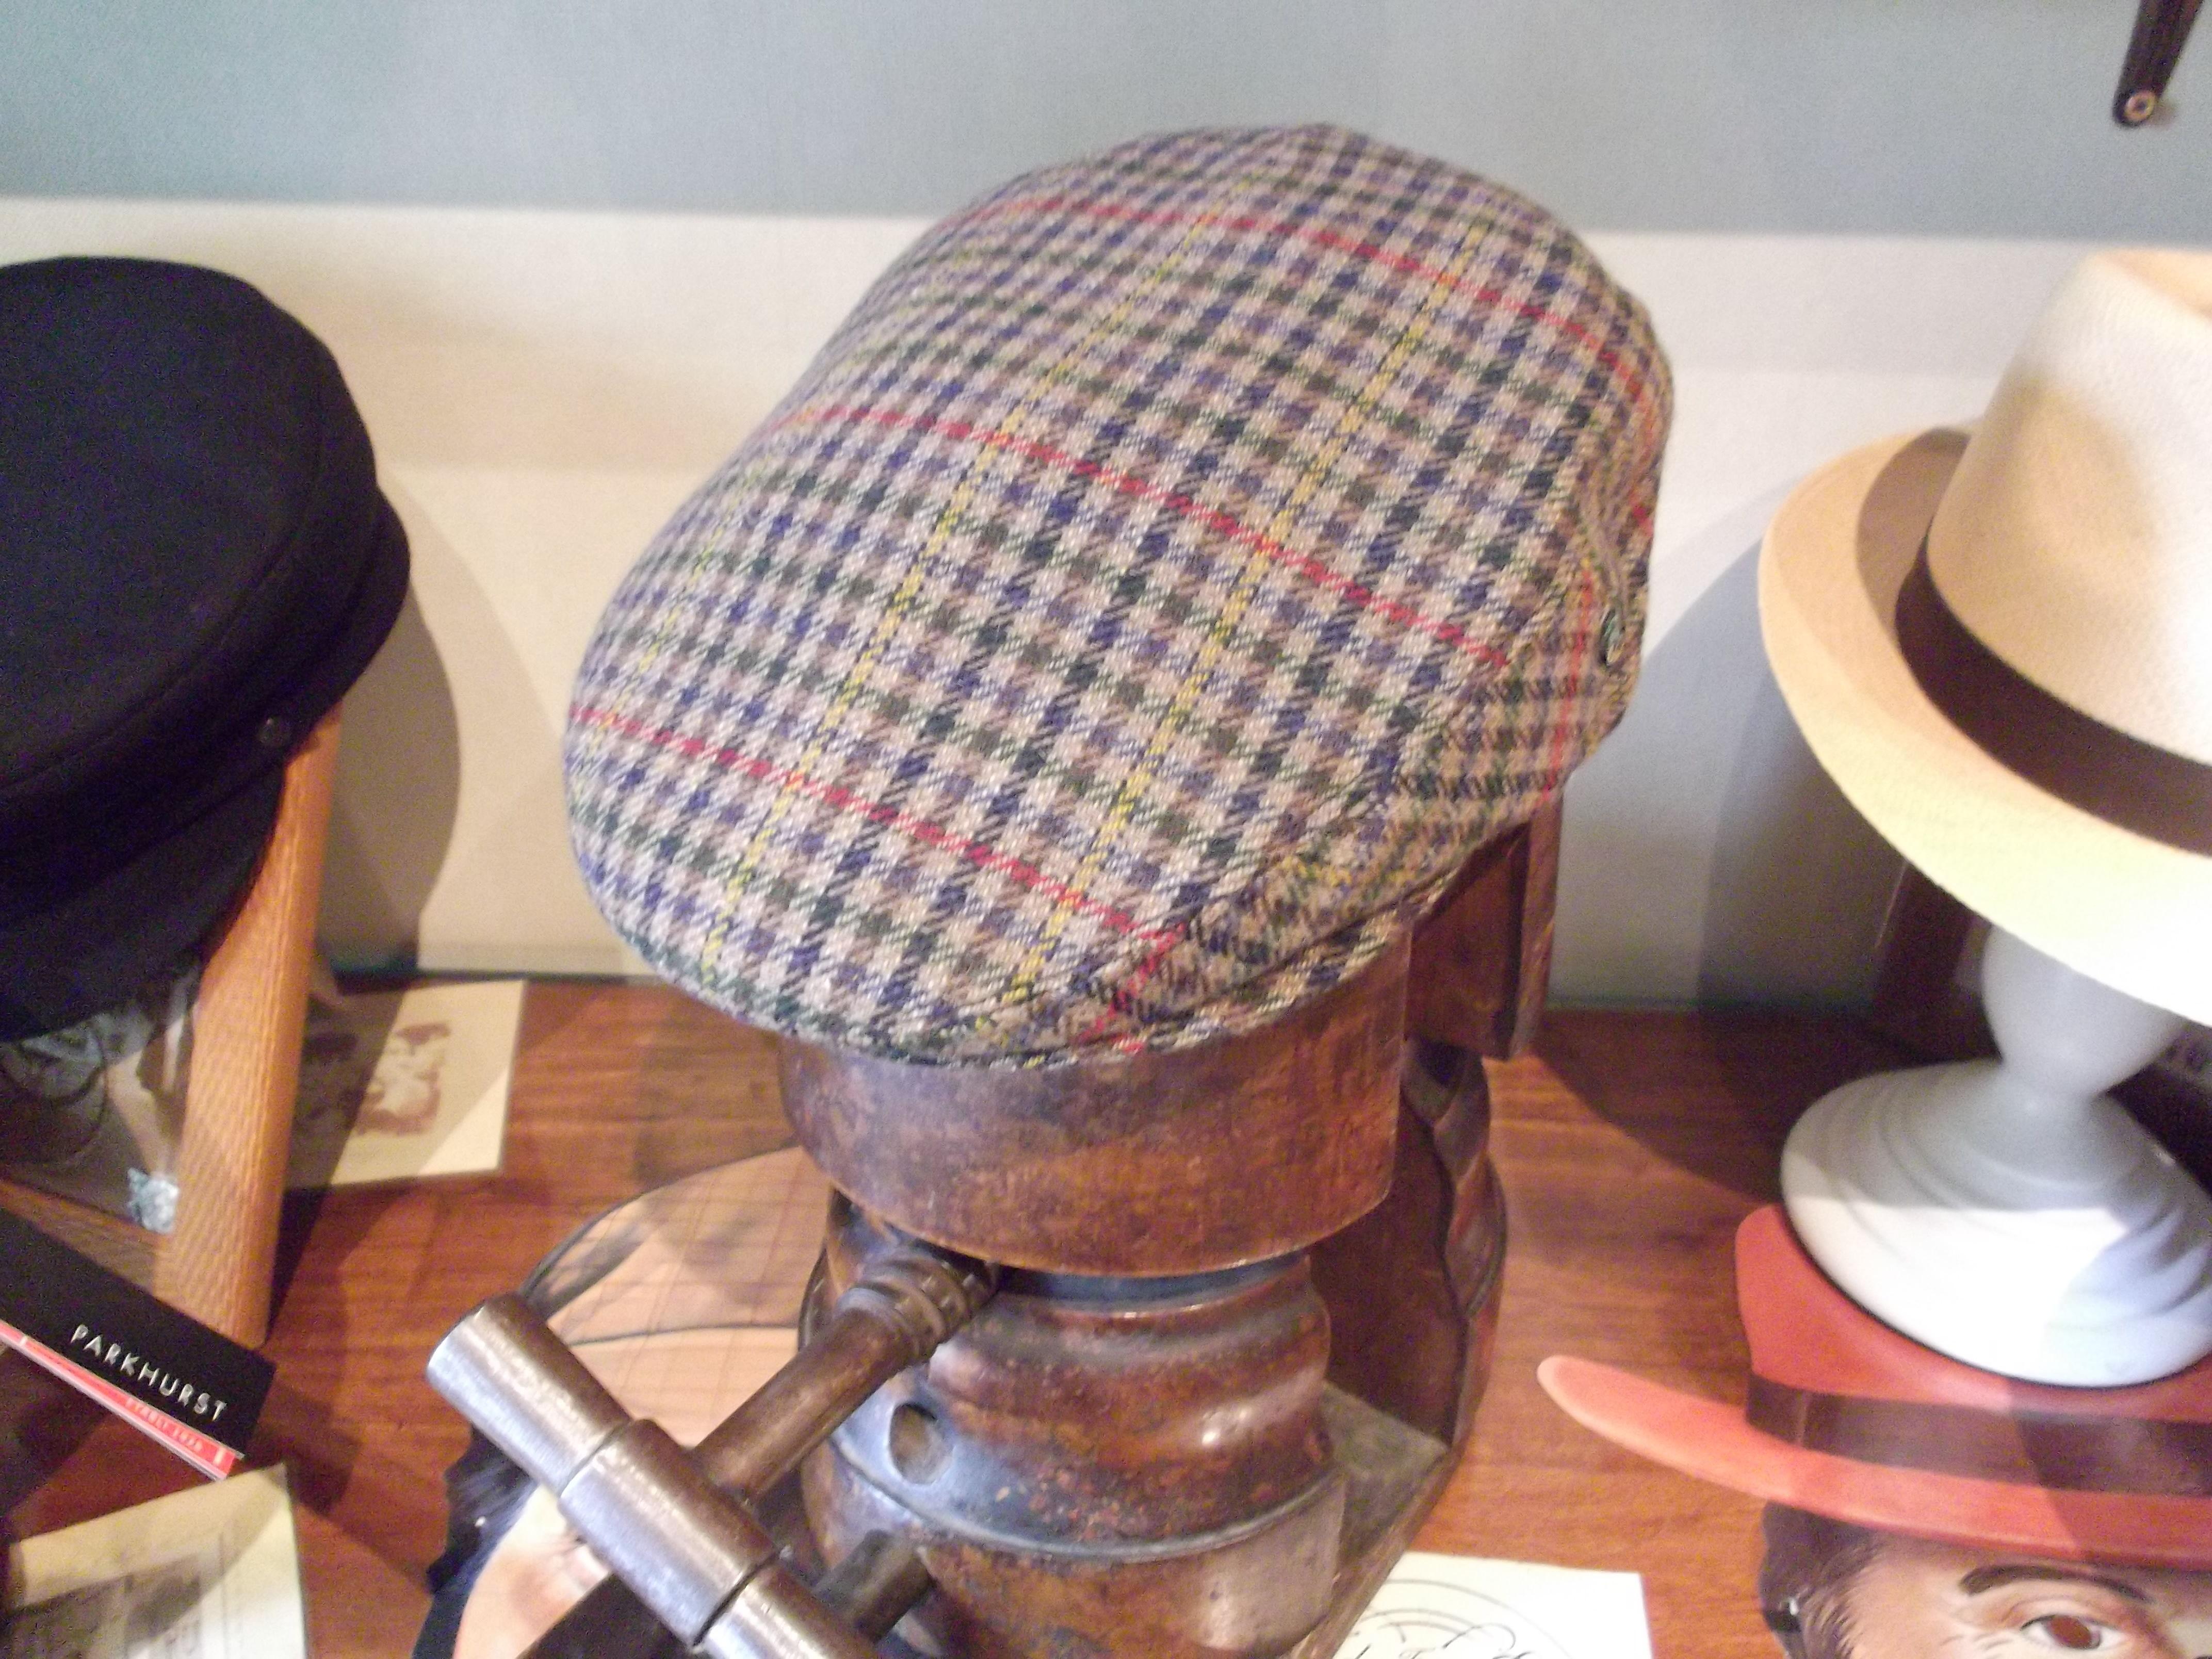 Gorra cachemir and wool. Tallas de la 56 a la 61: Catálogo de Sombrerería Citysport